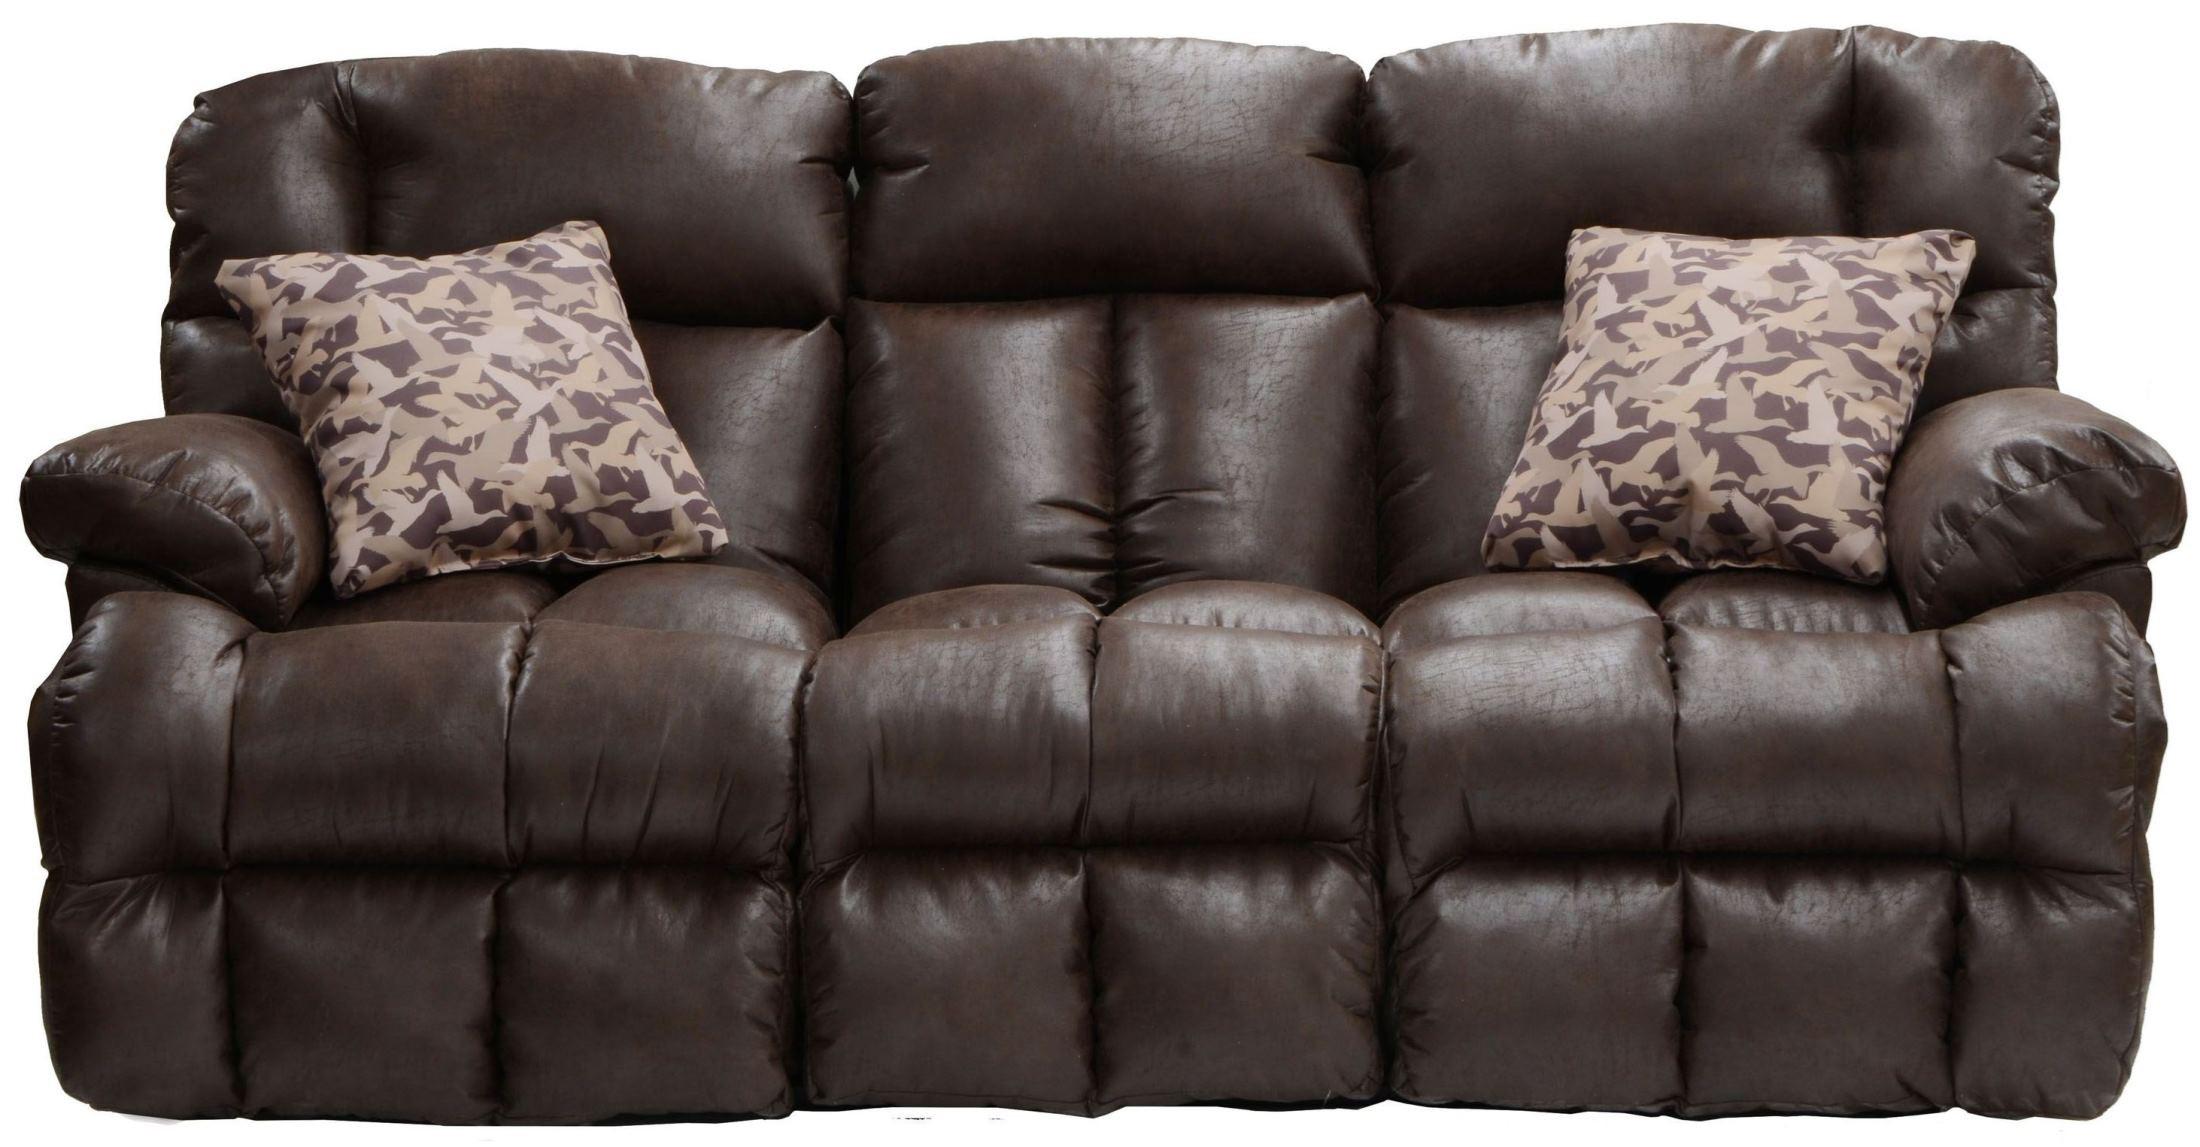 Cedar Creek Sable And Duck Camo Lay Flat Reclining Living Room Set 1325 1227 09 1829 49 Duck